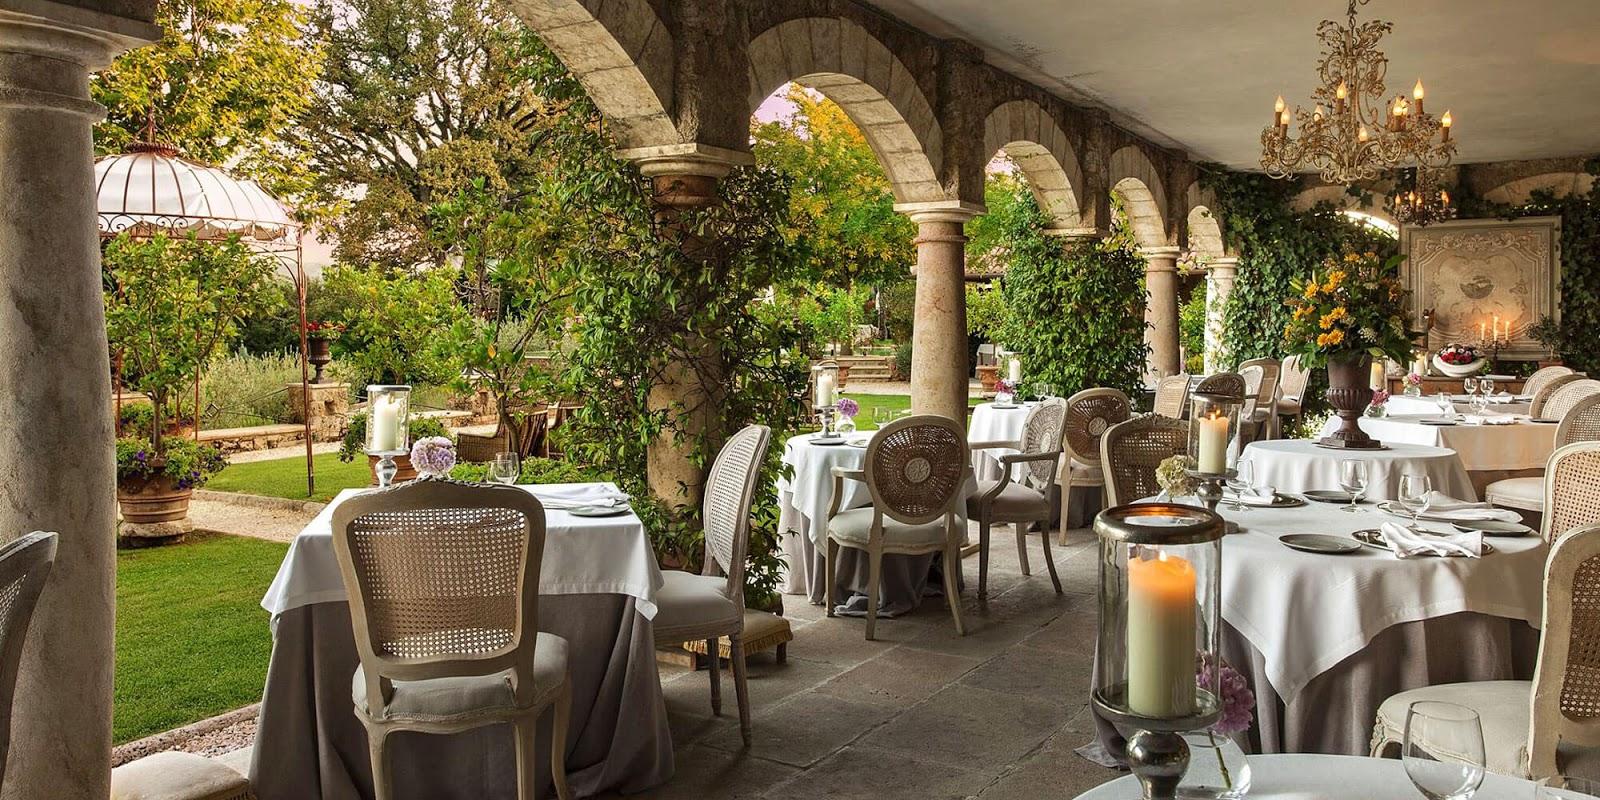 Breathtaking terrace at the Italian villa Borgo Santo Pietro - found on Hello Lovely Studio